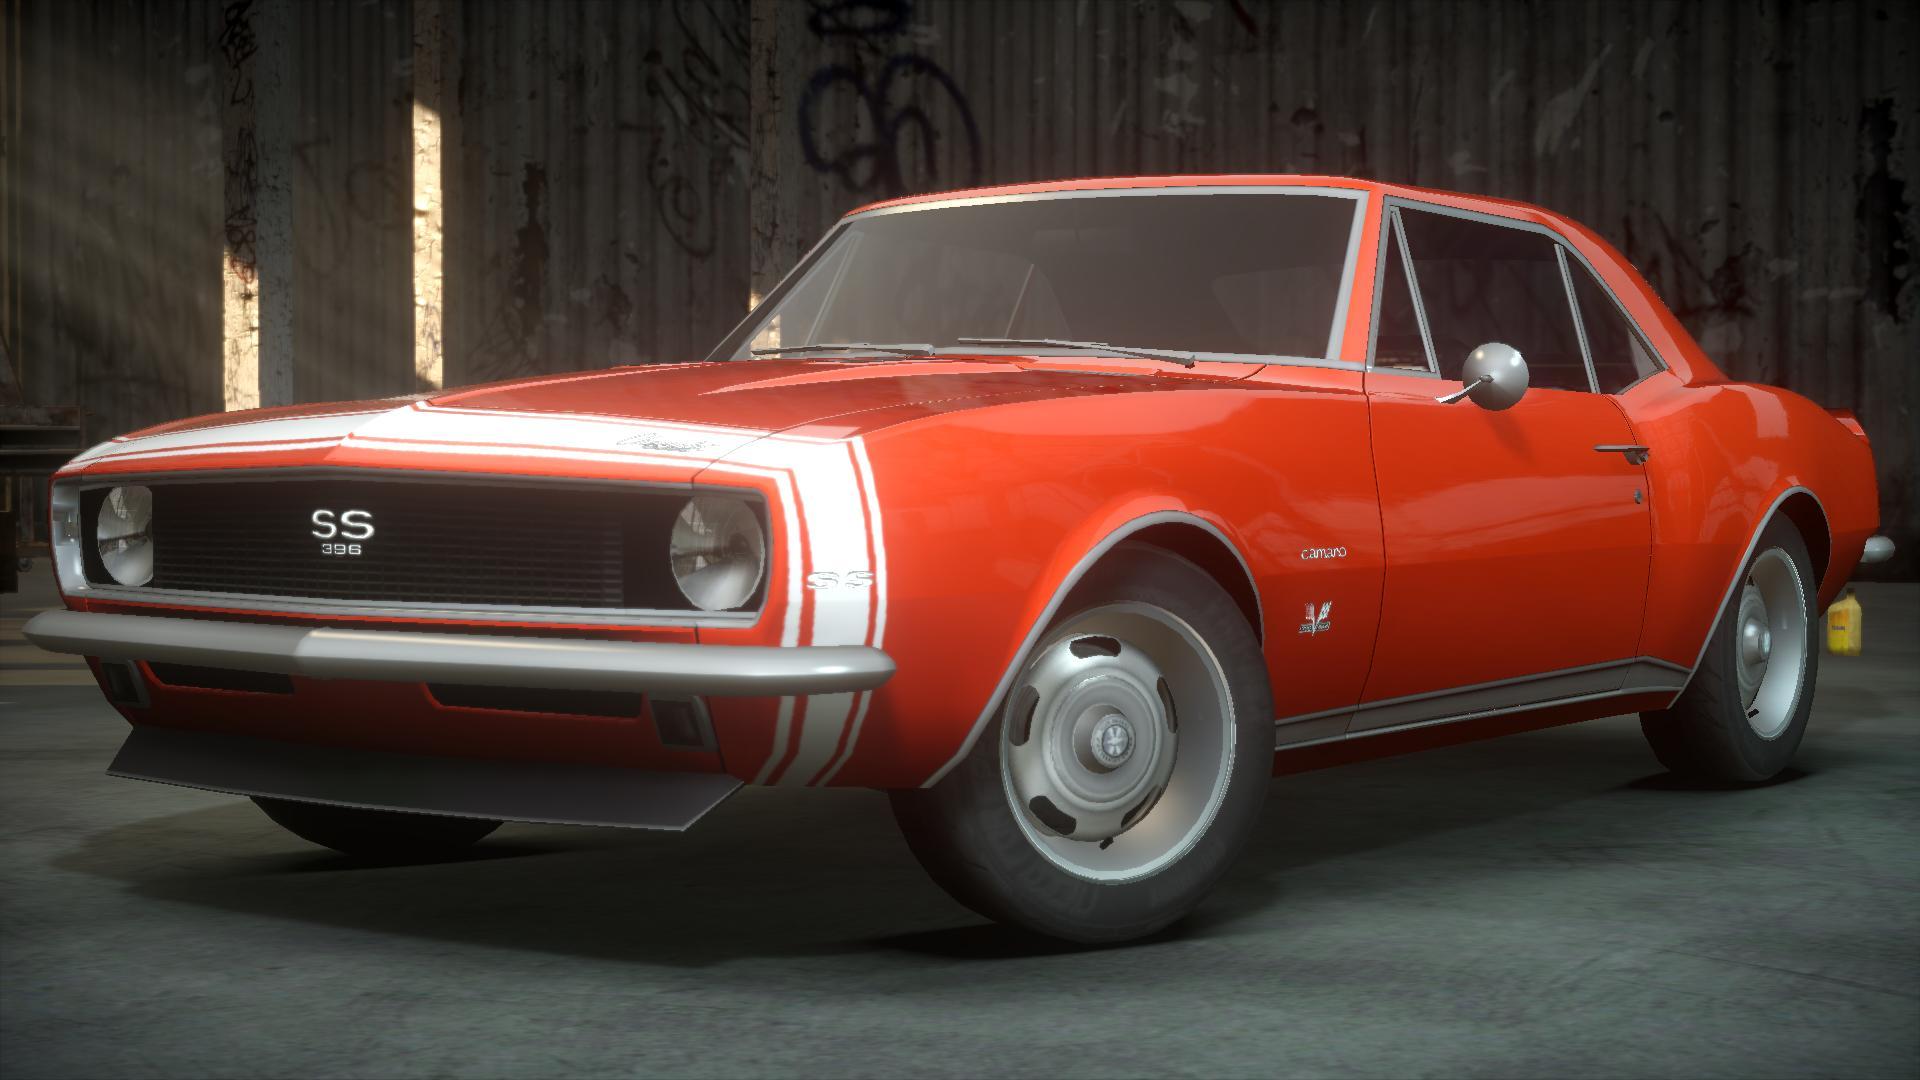 Chevrolet Camaro SS 396 (1967)